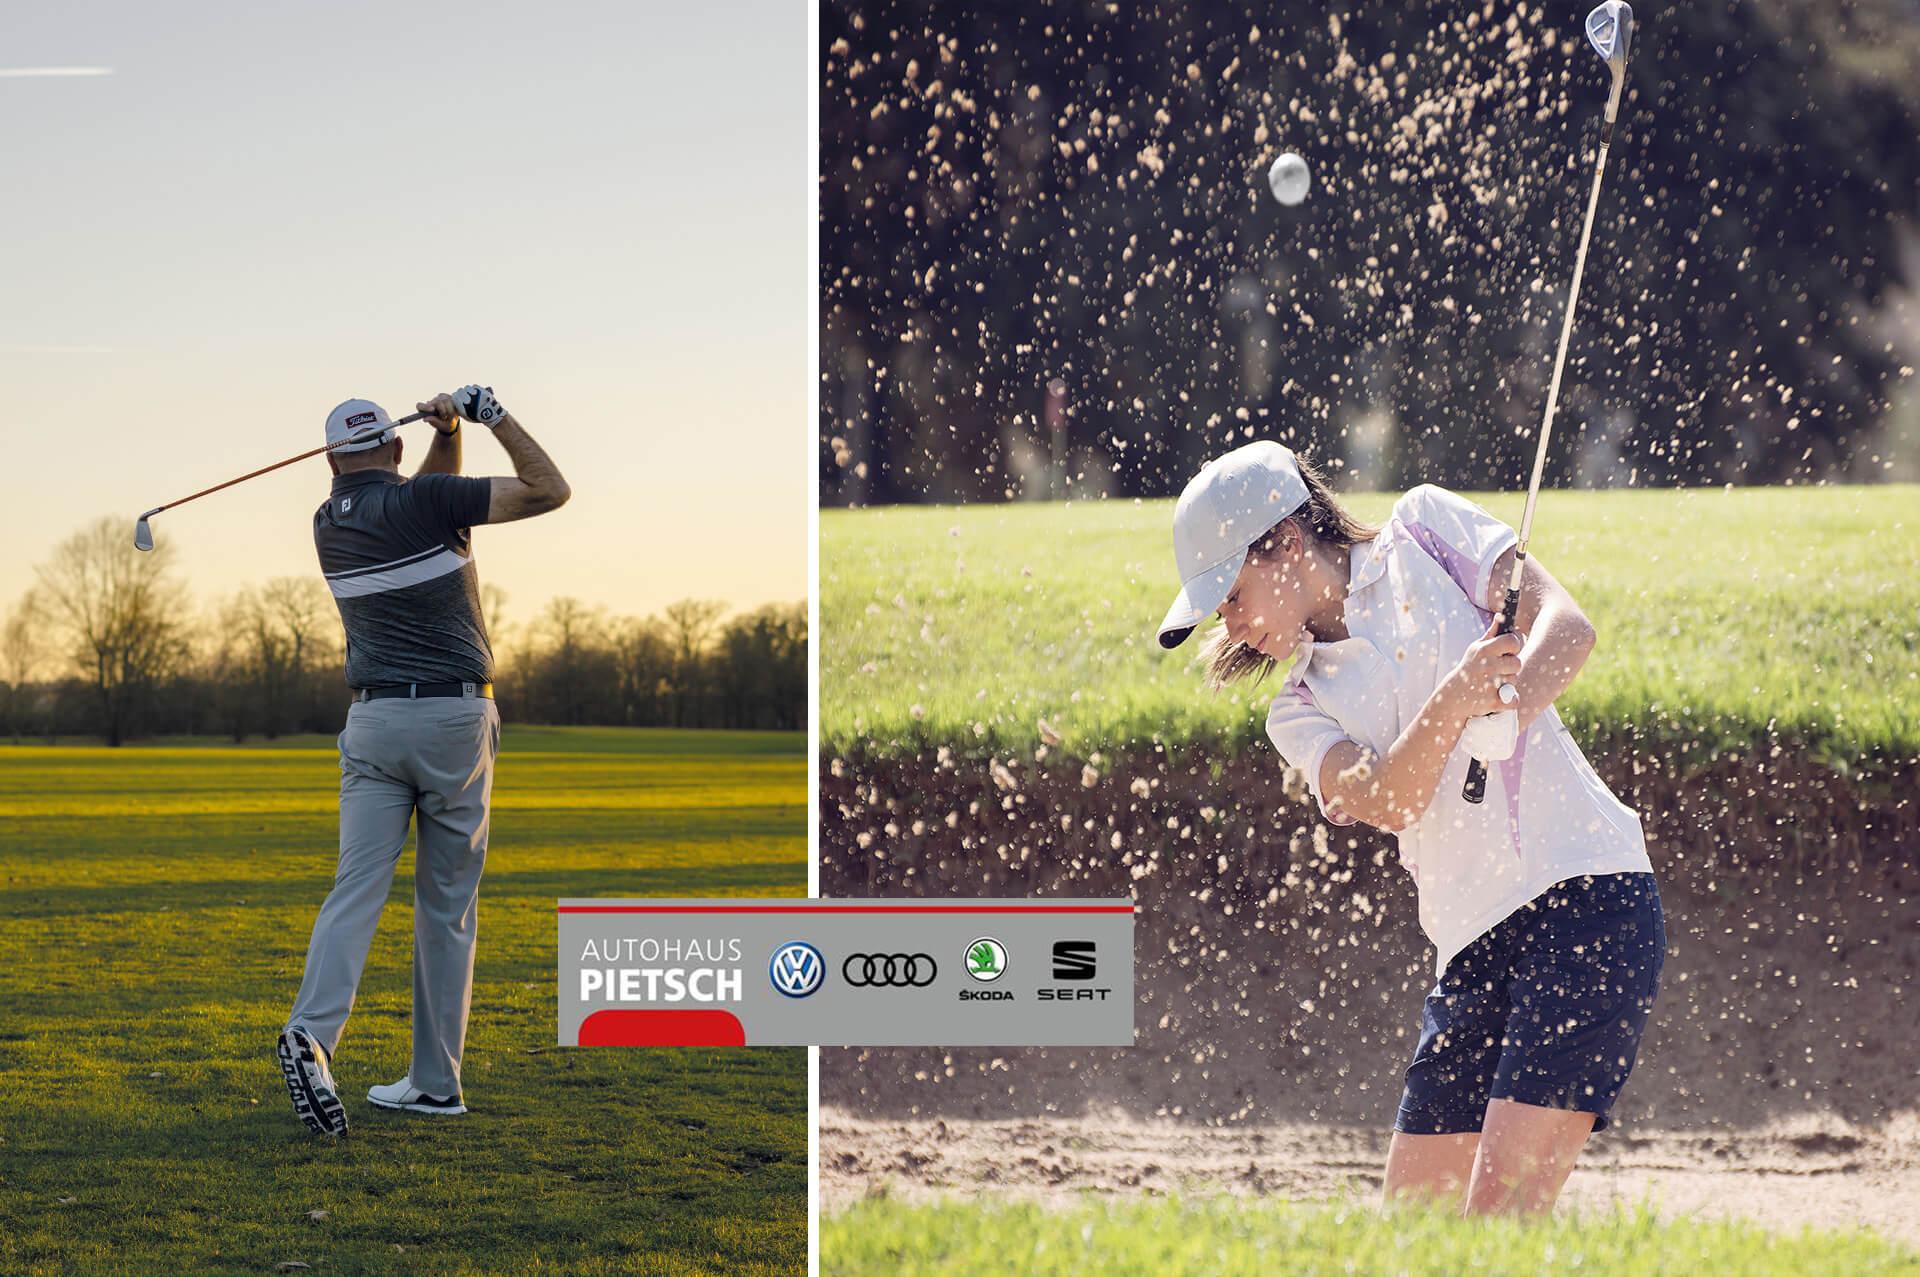 https://golfclub-peckeloh.de/wp-content/uploads/2019/05/Golfer_Header_Audi.jpg